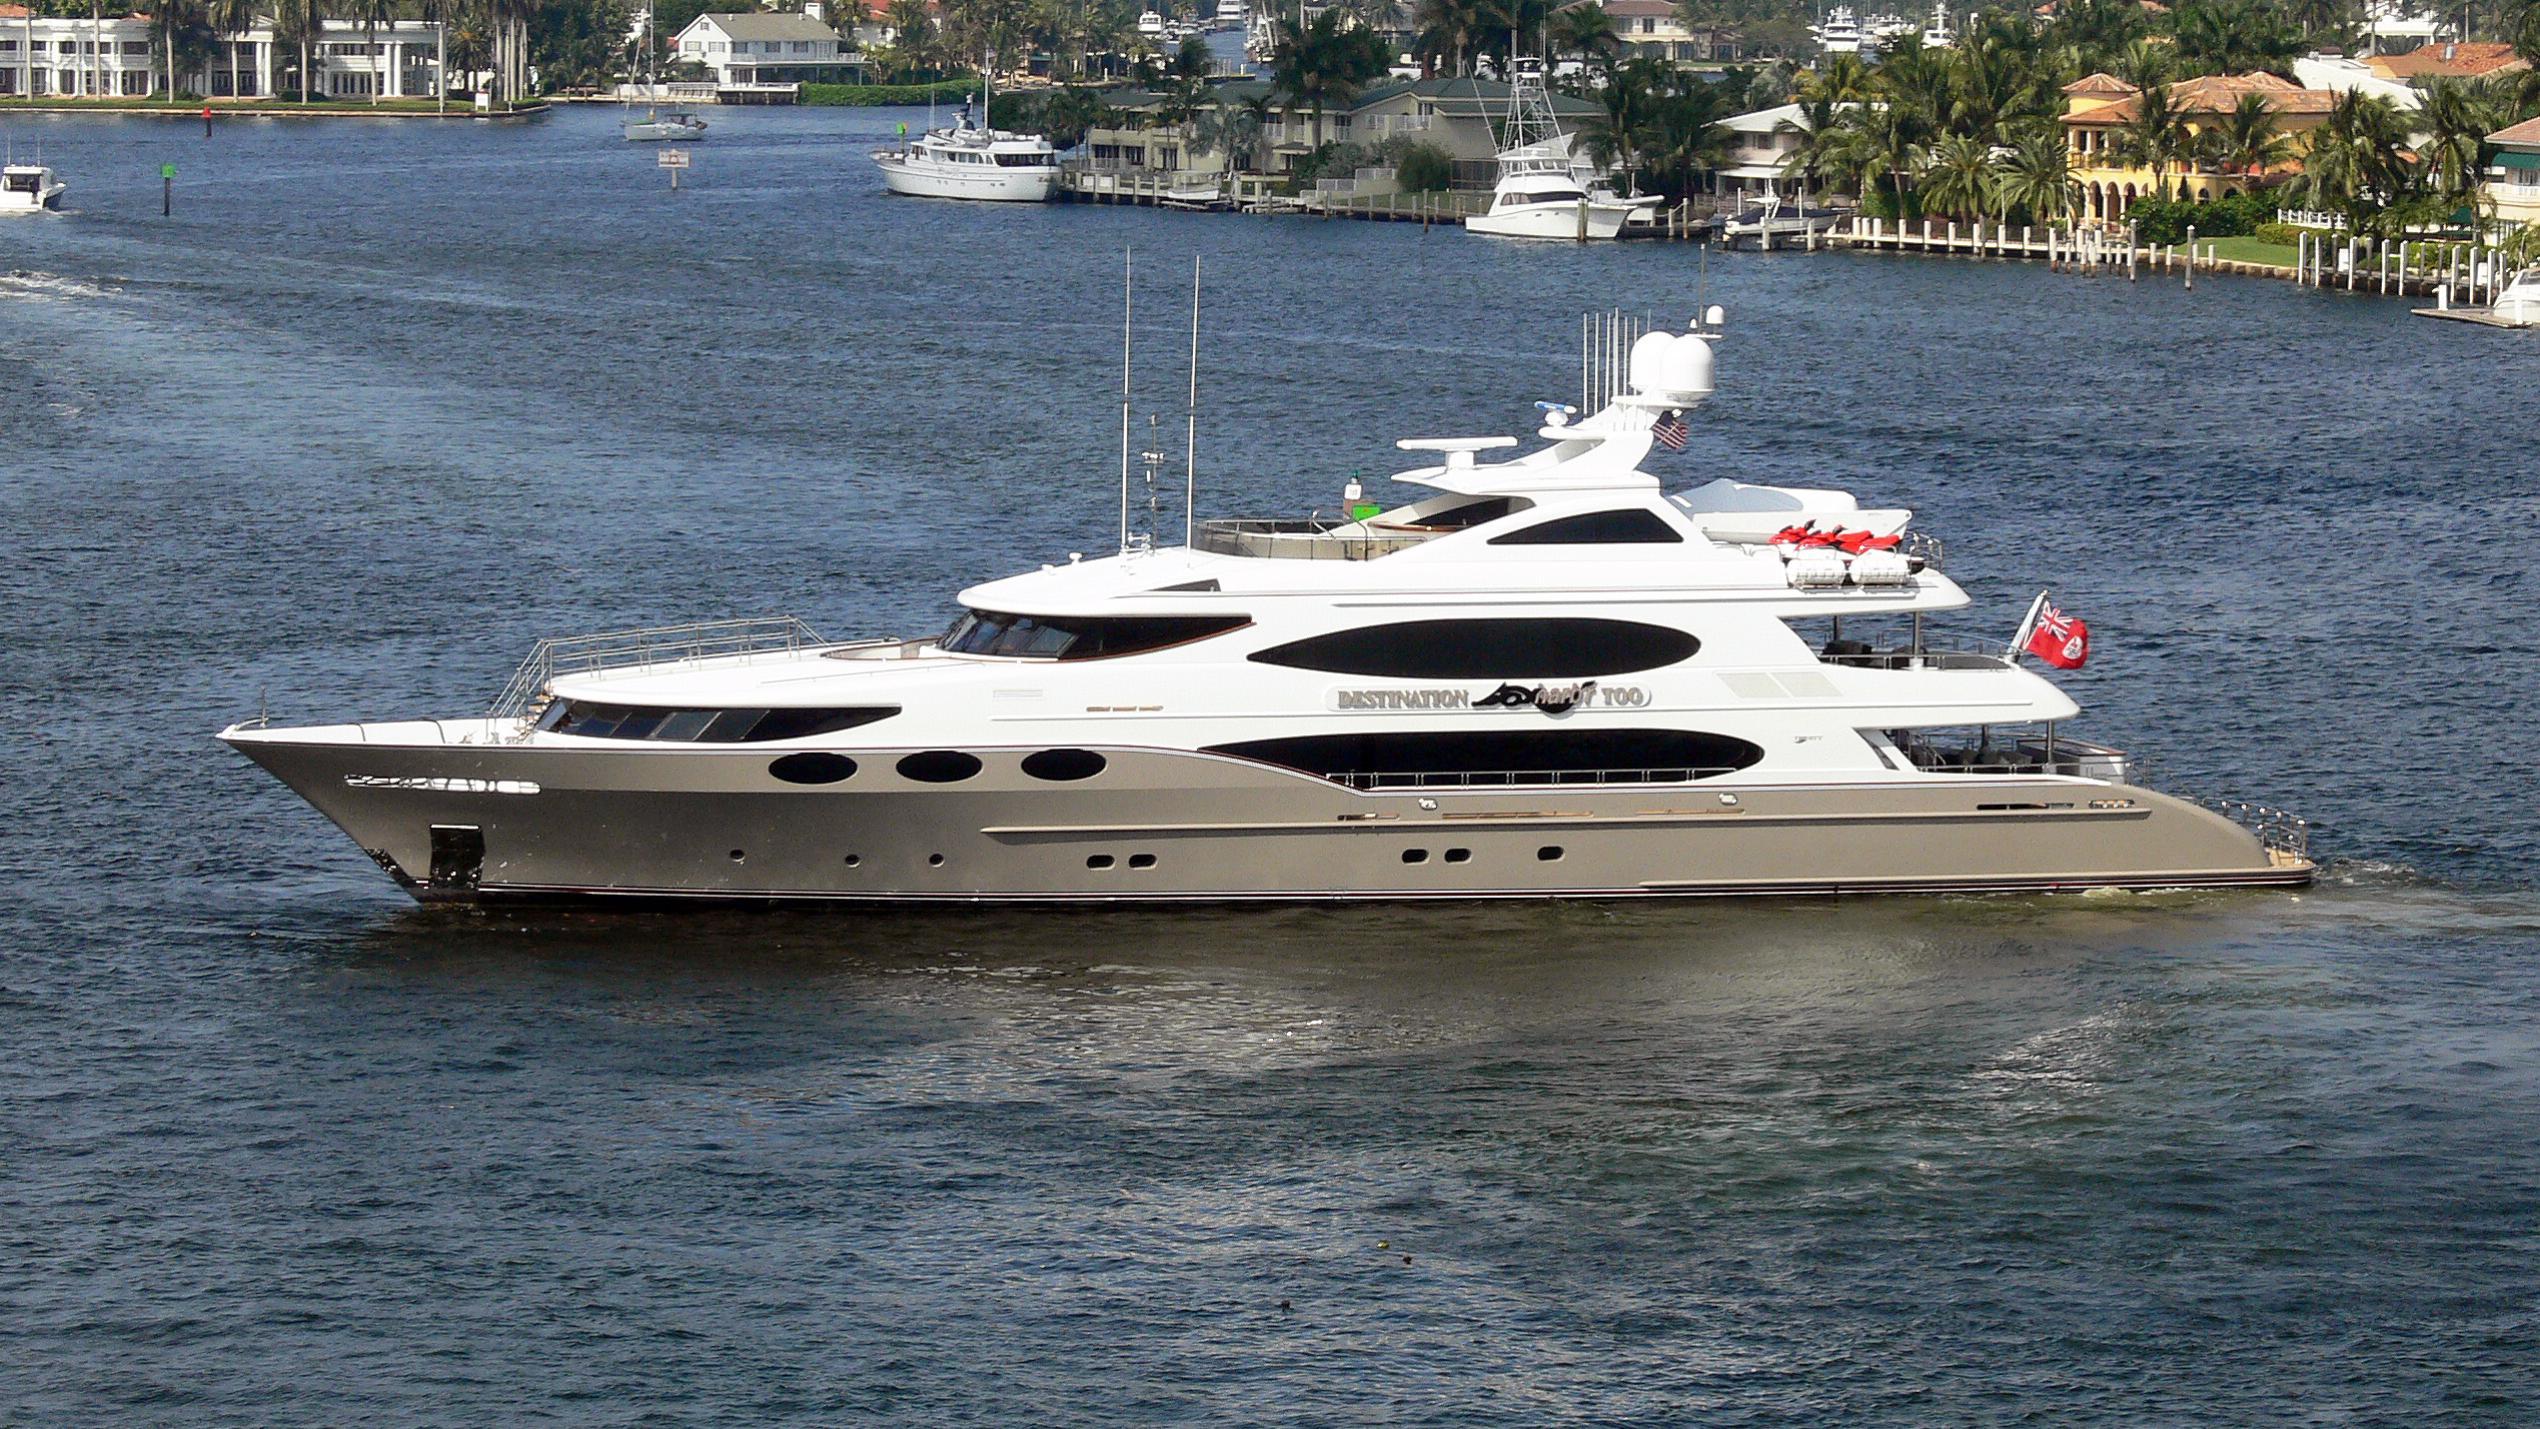 hunter-mustang-sally-motor-yacht-trinity-161-2008-49m-profile